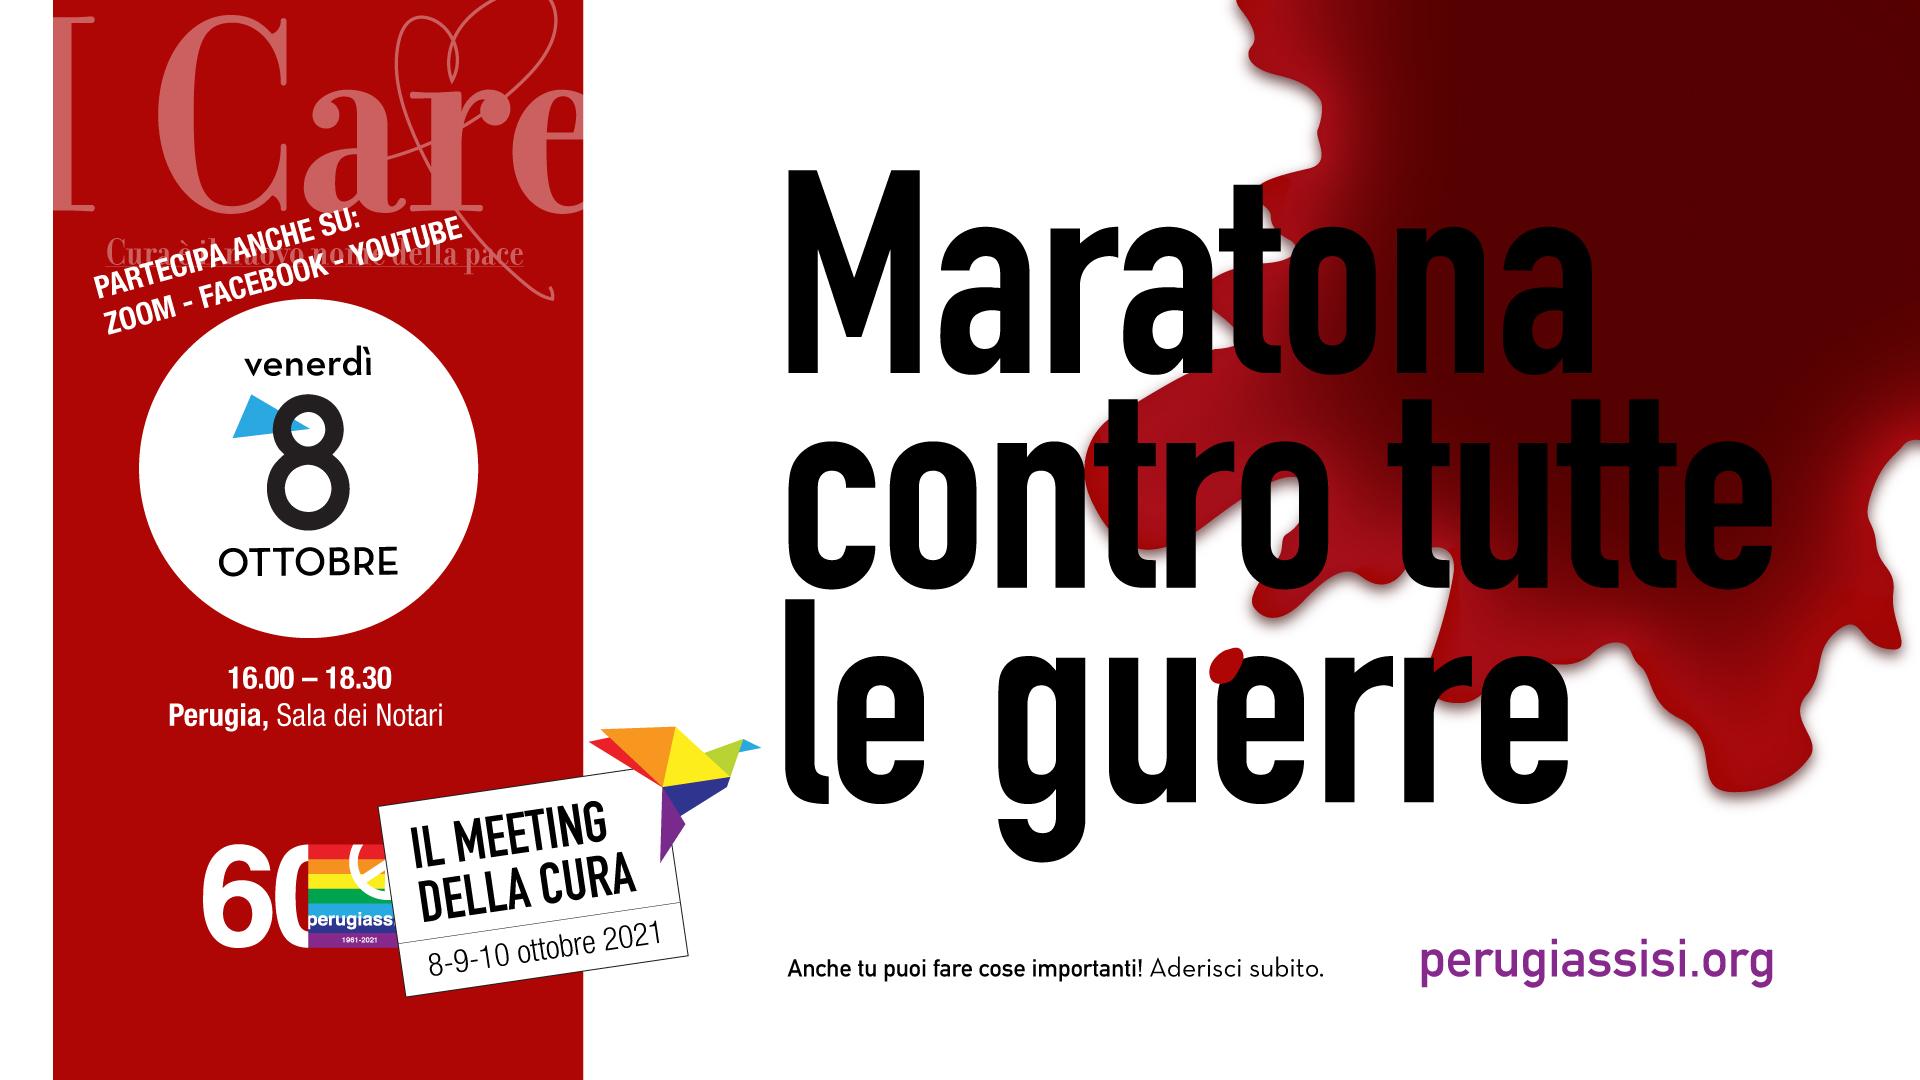 8 ottobre Maratona